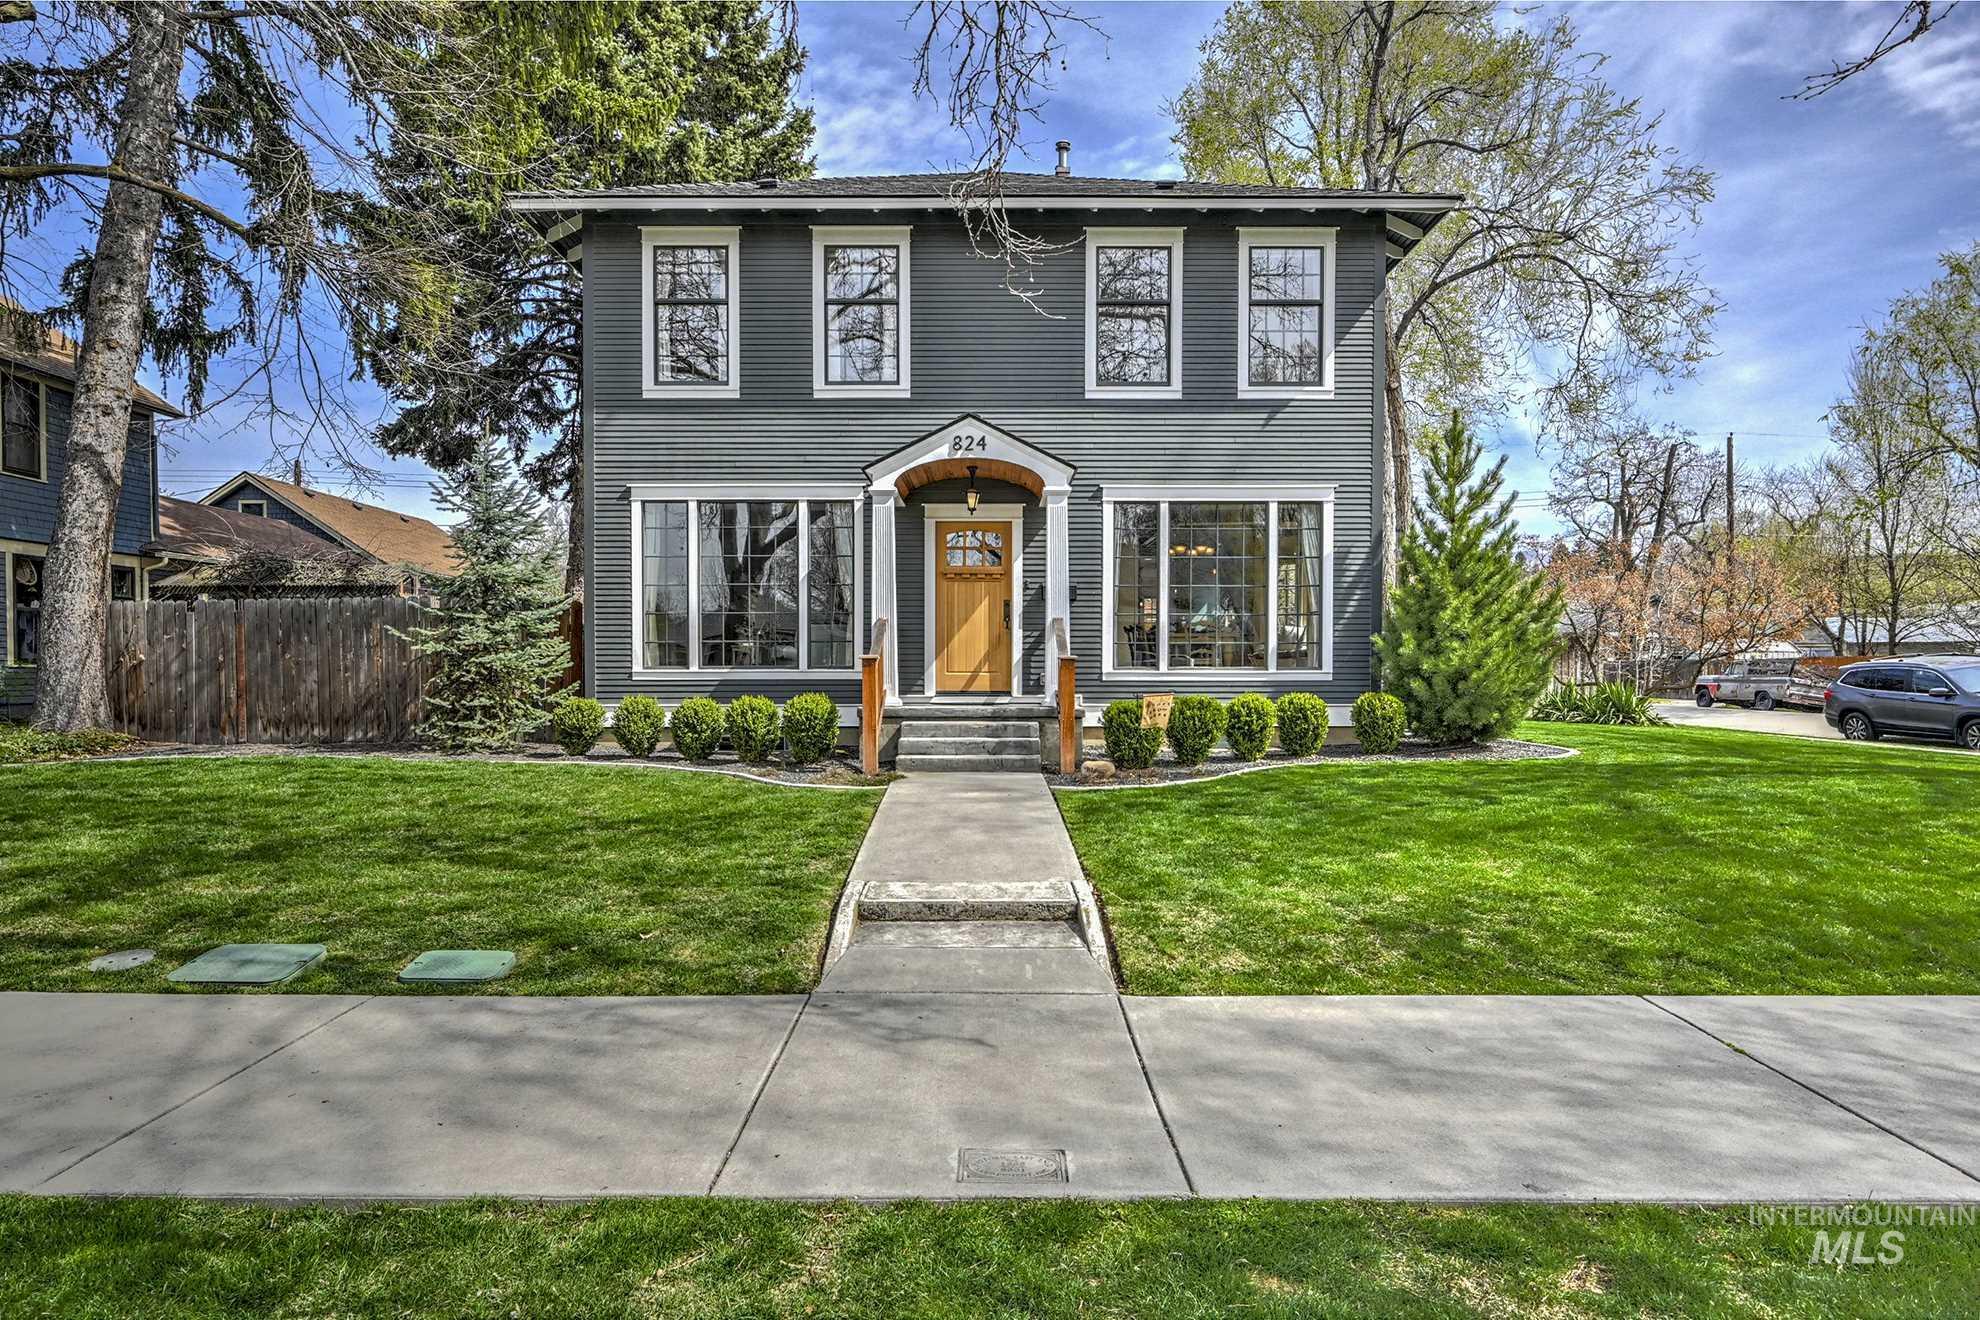 824 E State St Property Photo - Boise, ID real estate listing